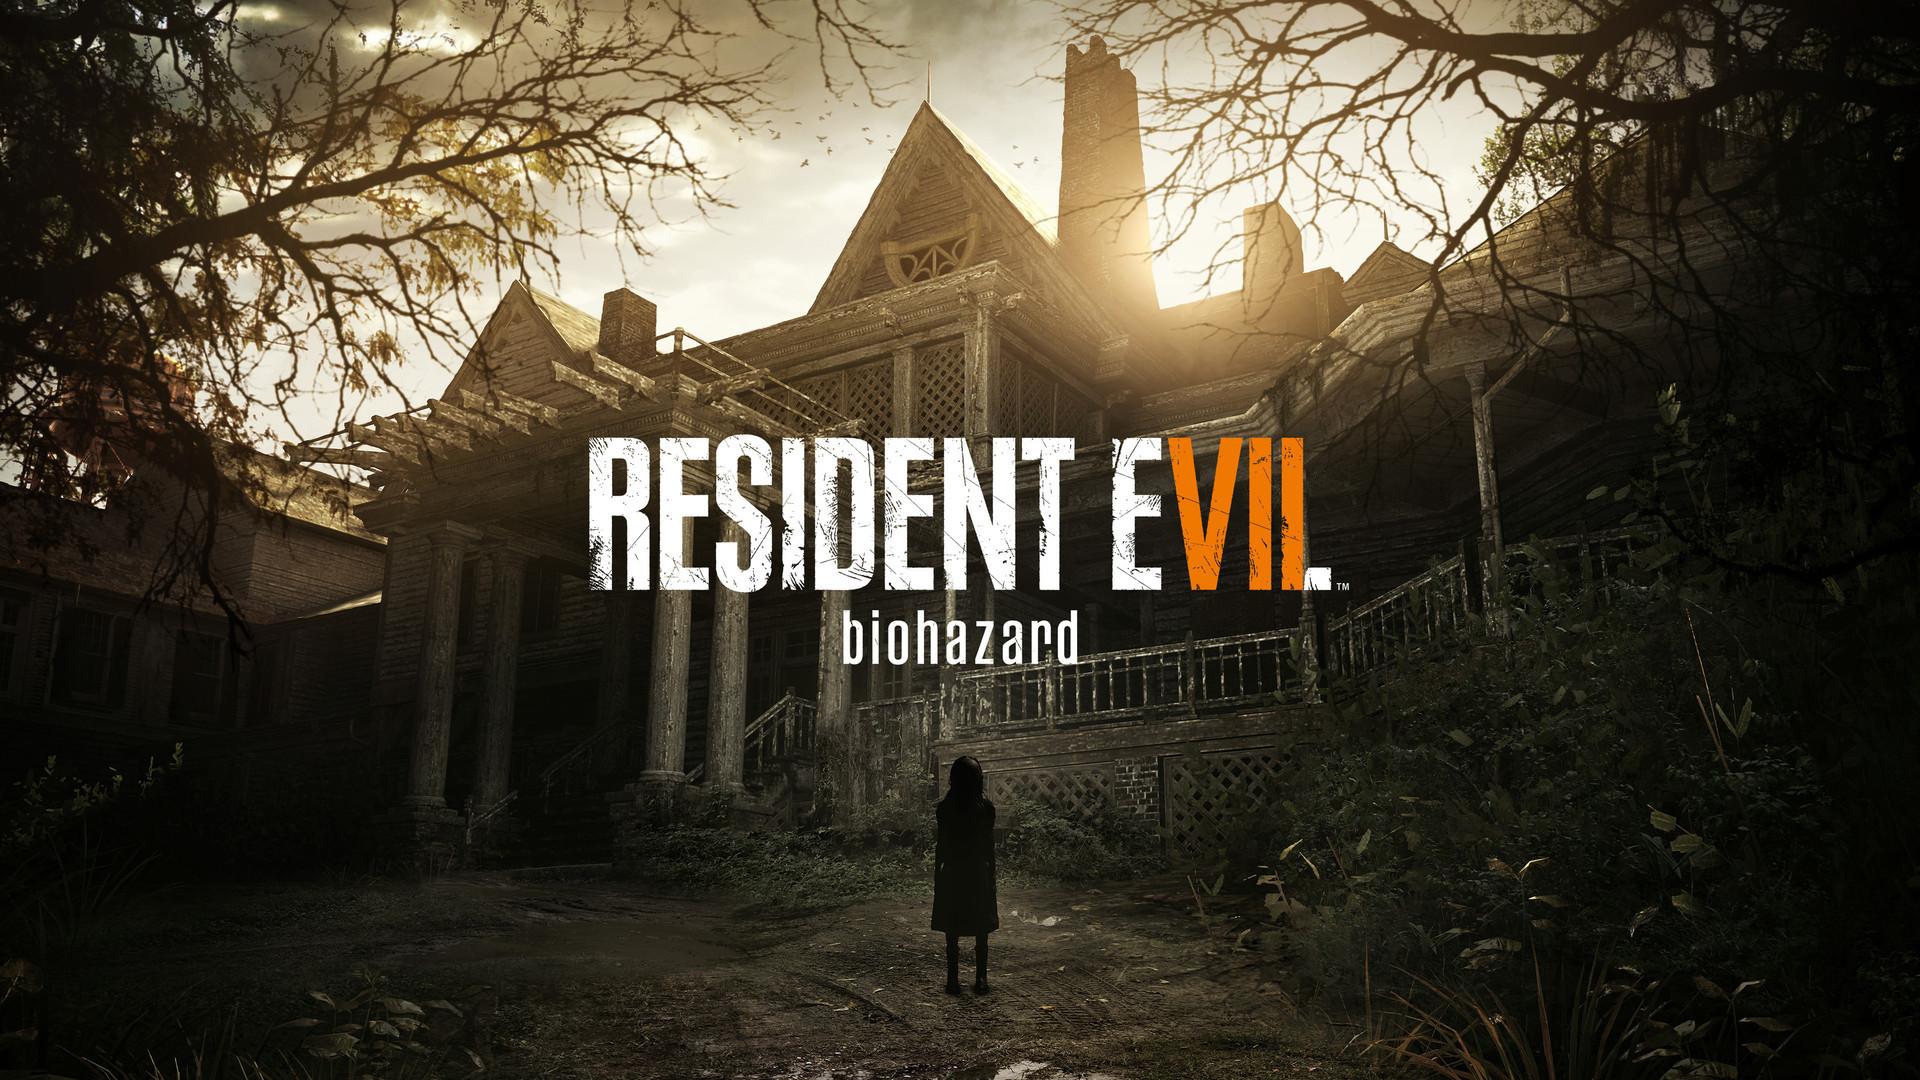 Resident Evil Vii Biohazard Cloud Version Gets First Gameplay Video